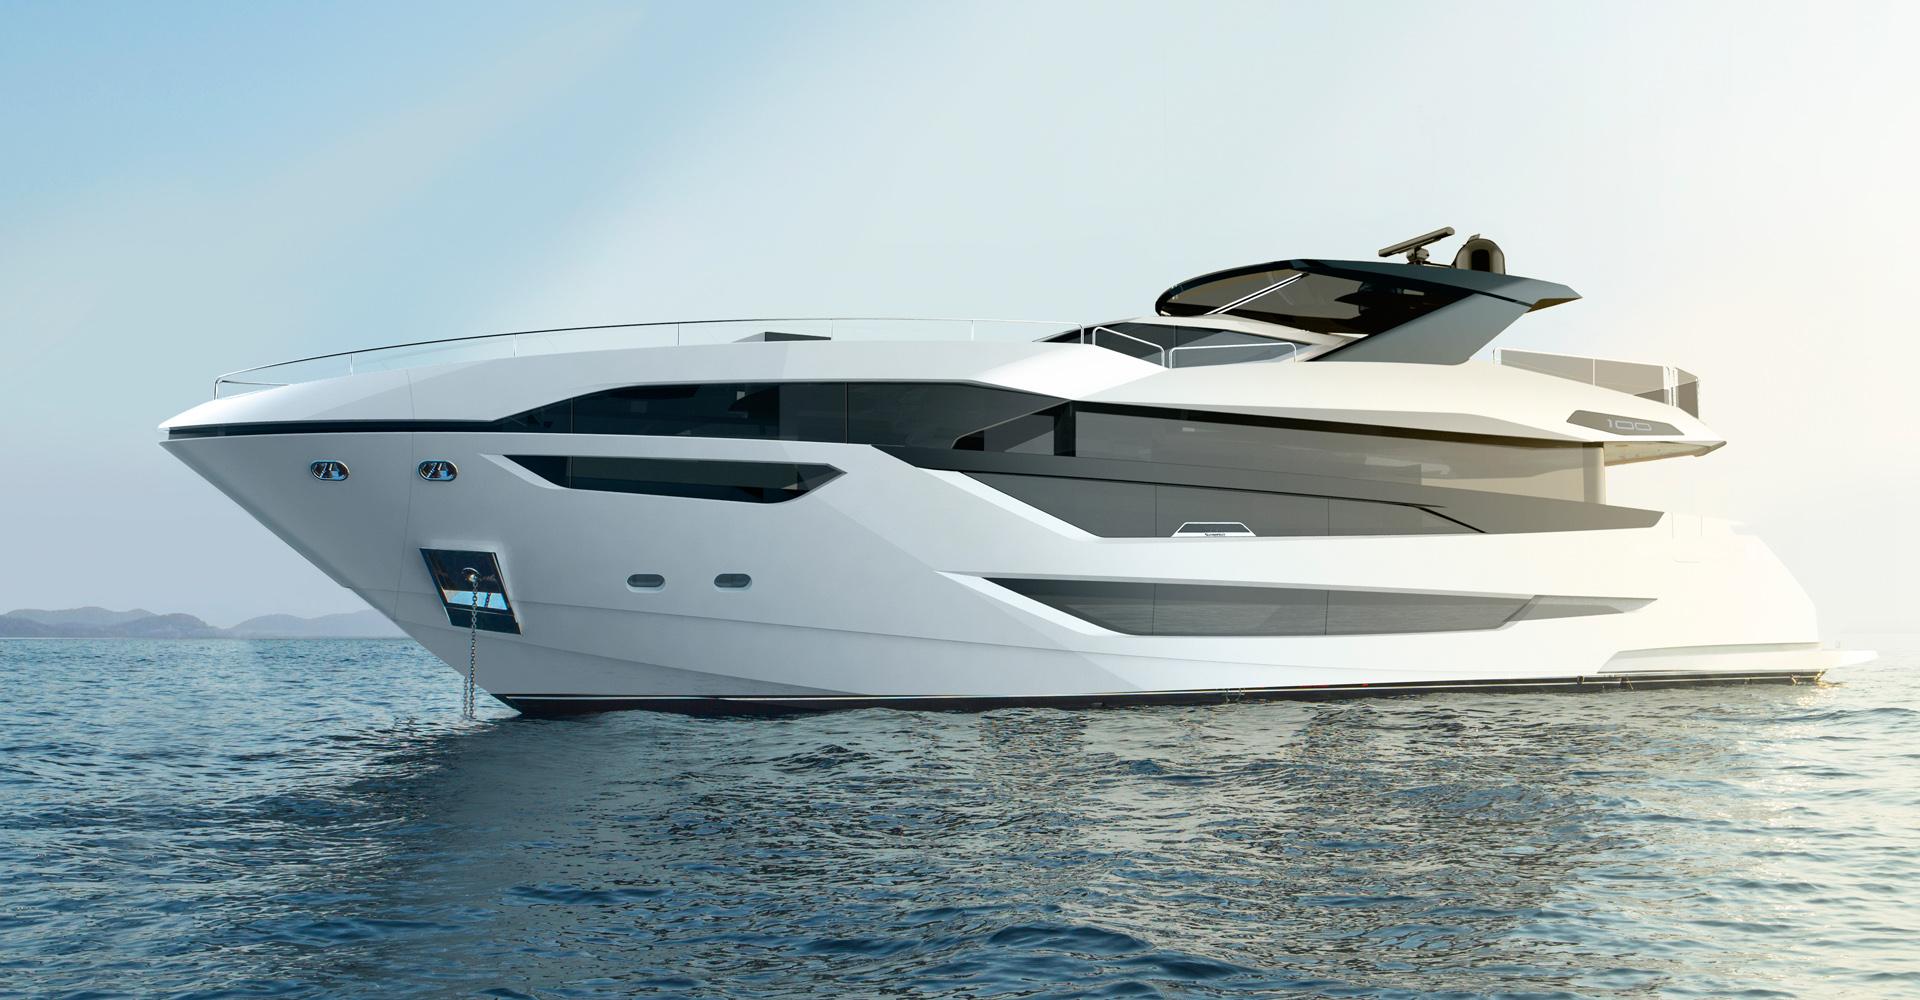 Exterior rendering of Sunseeker motor yacht